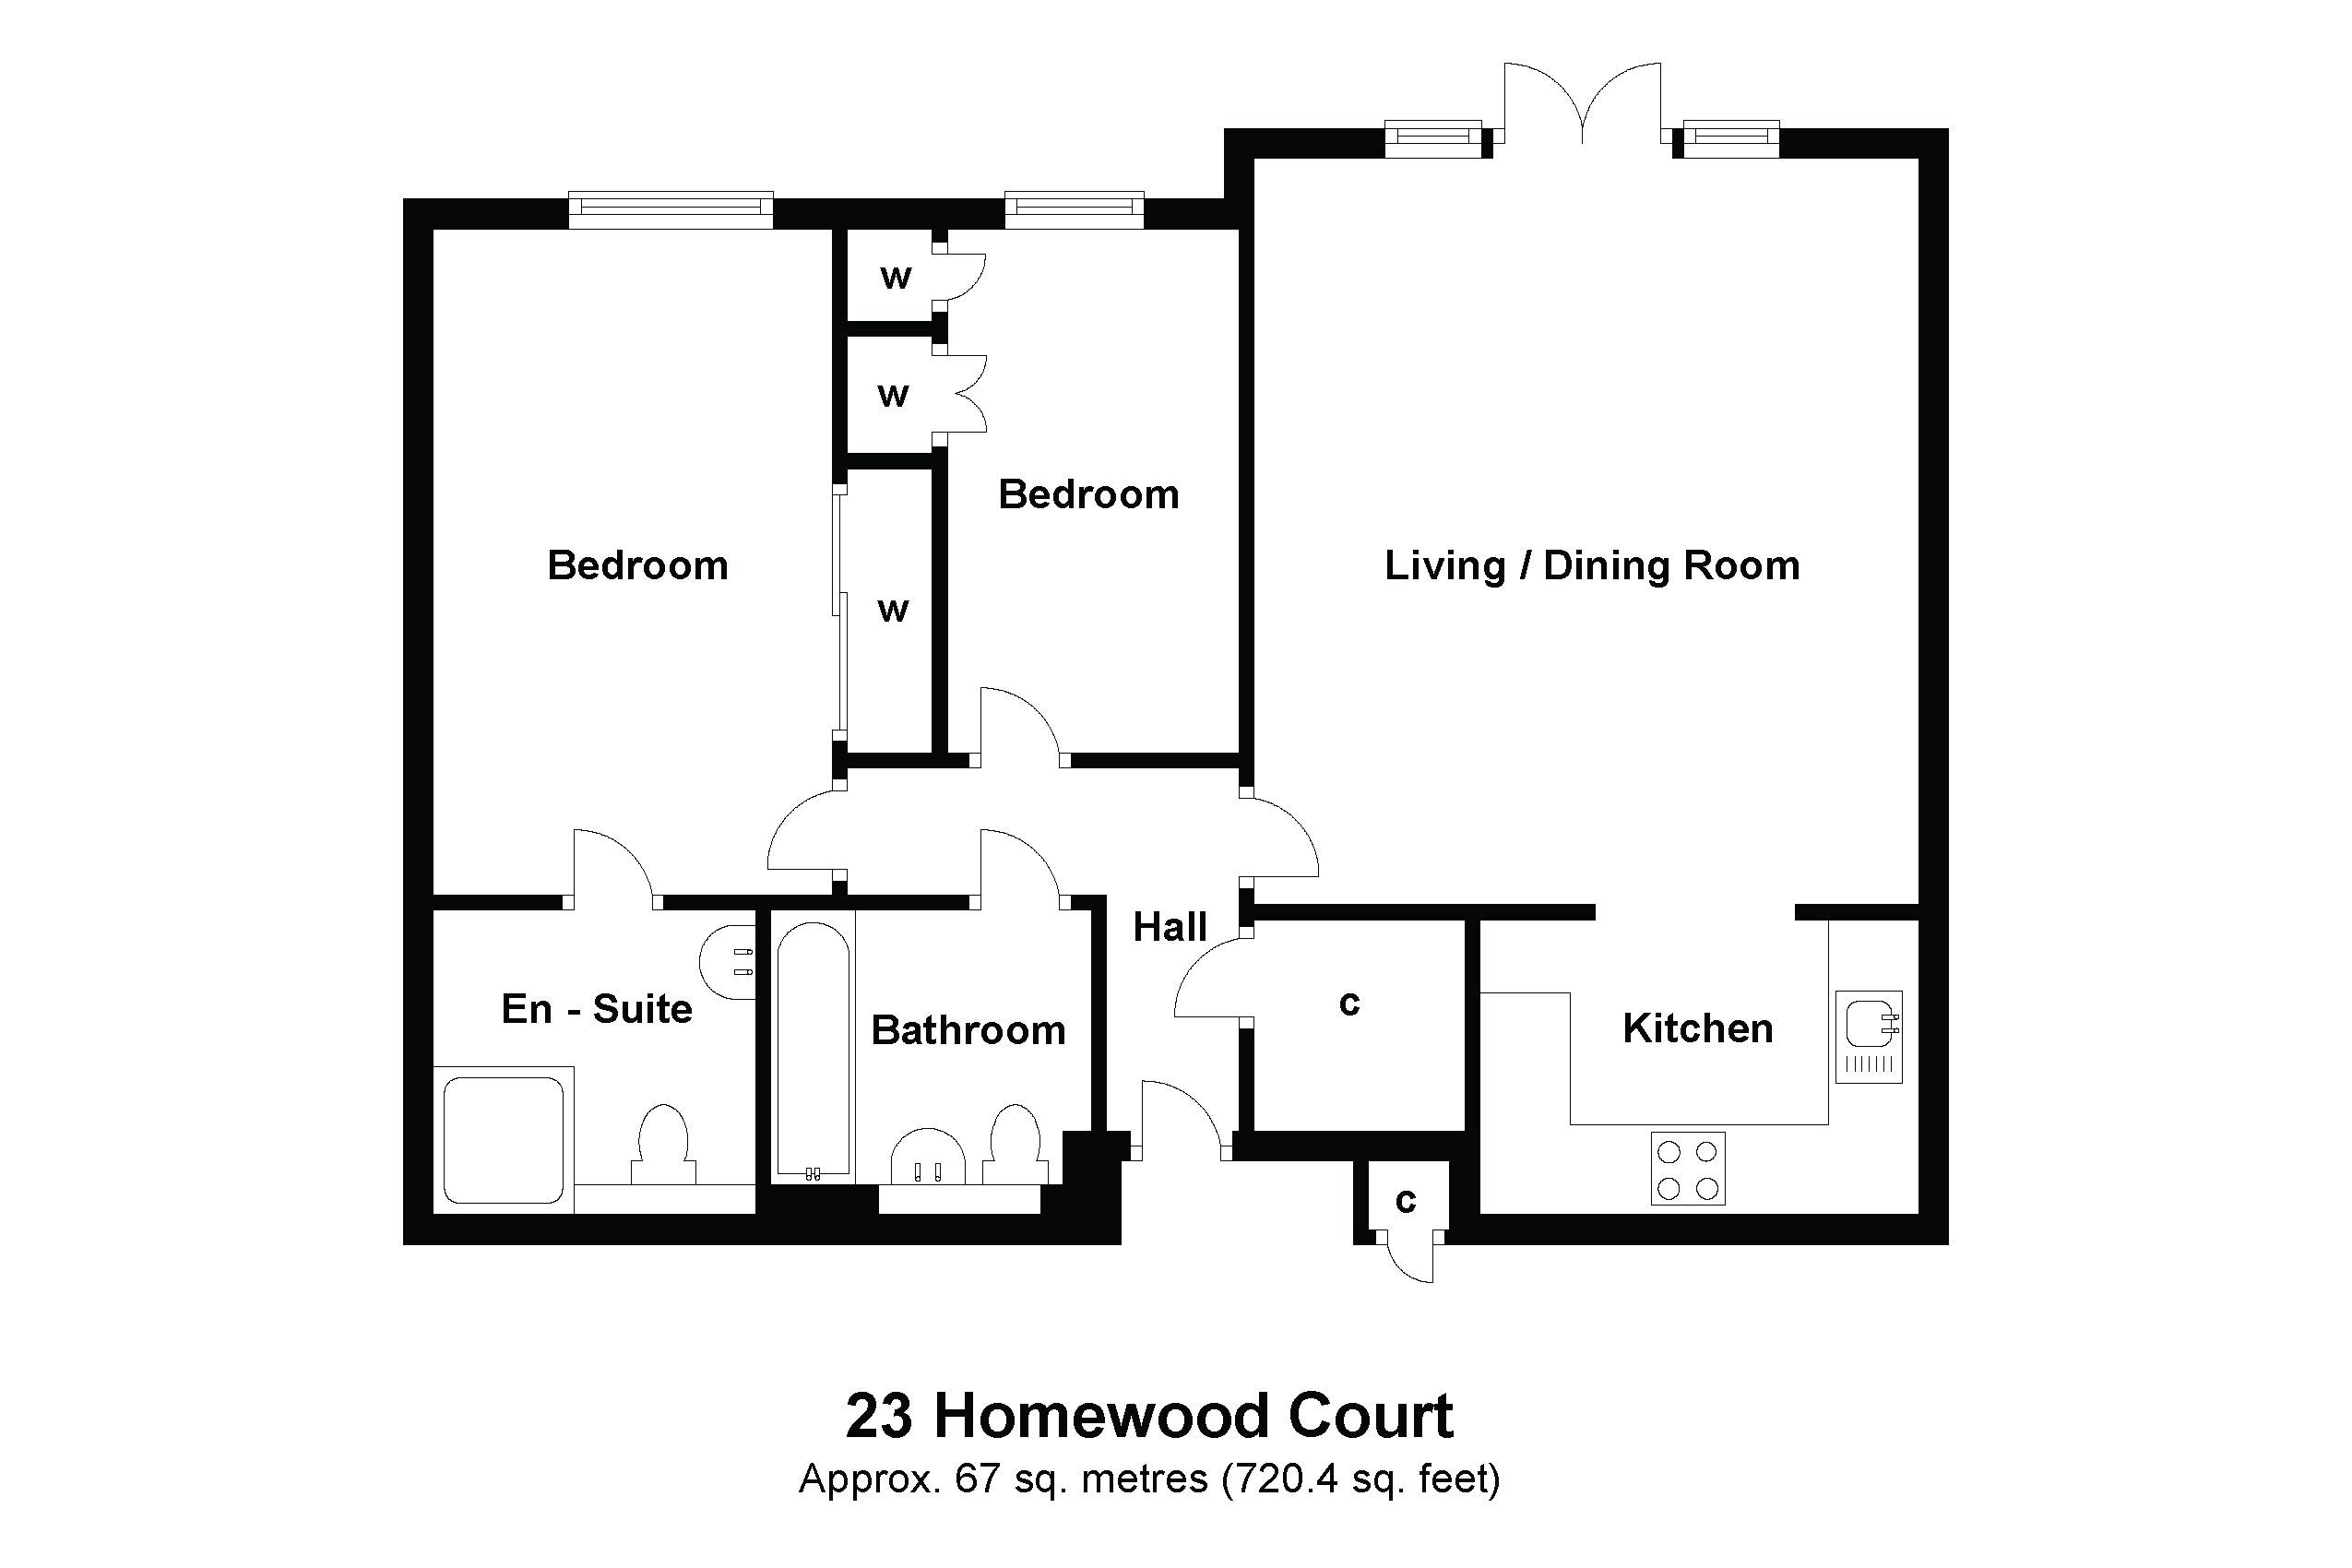 23 Homewood Court Floorplan